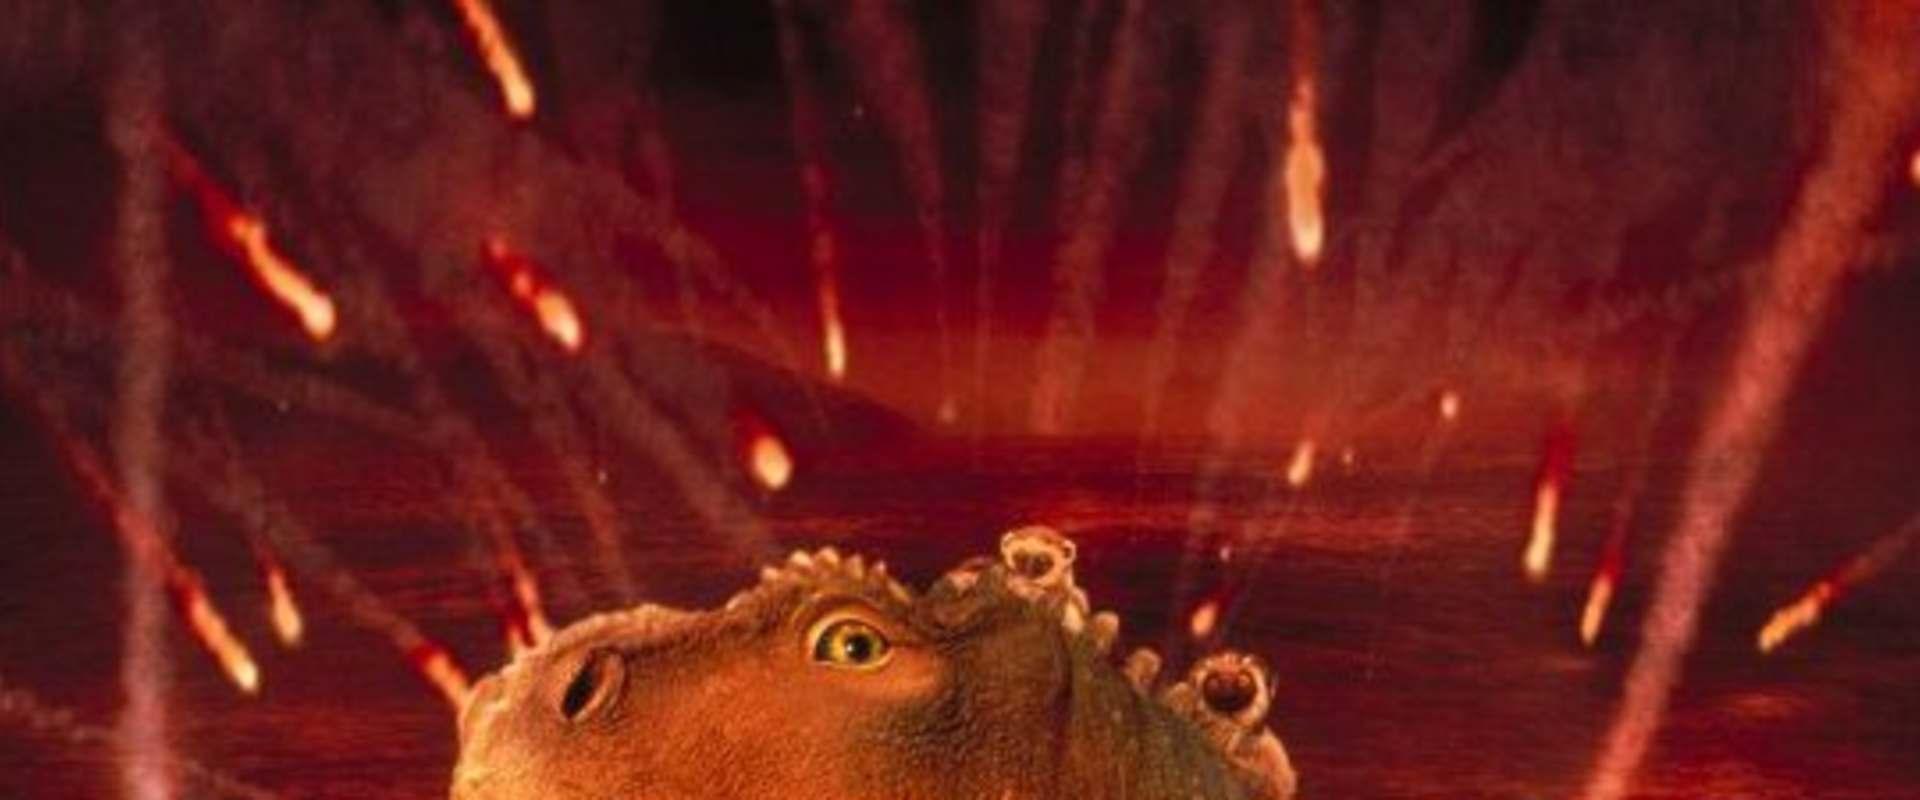 dinosaurs netflix